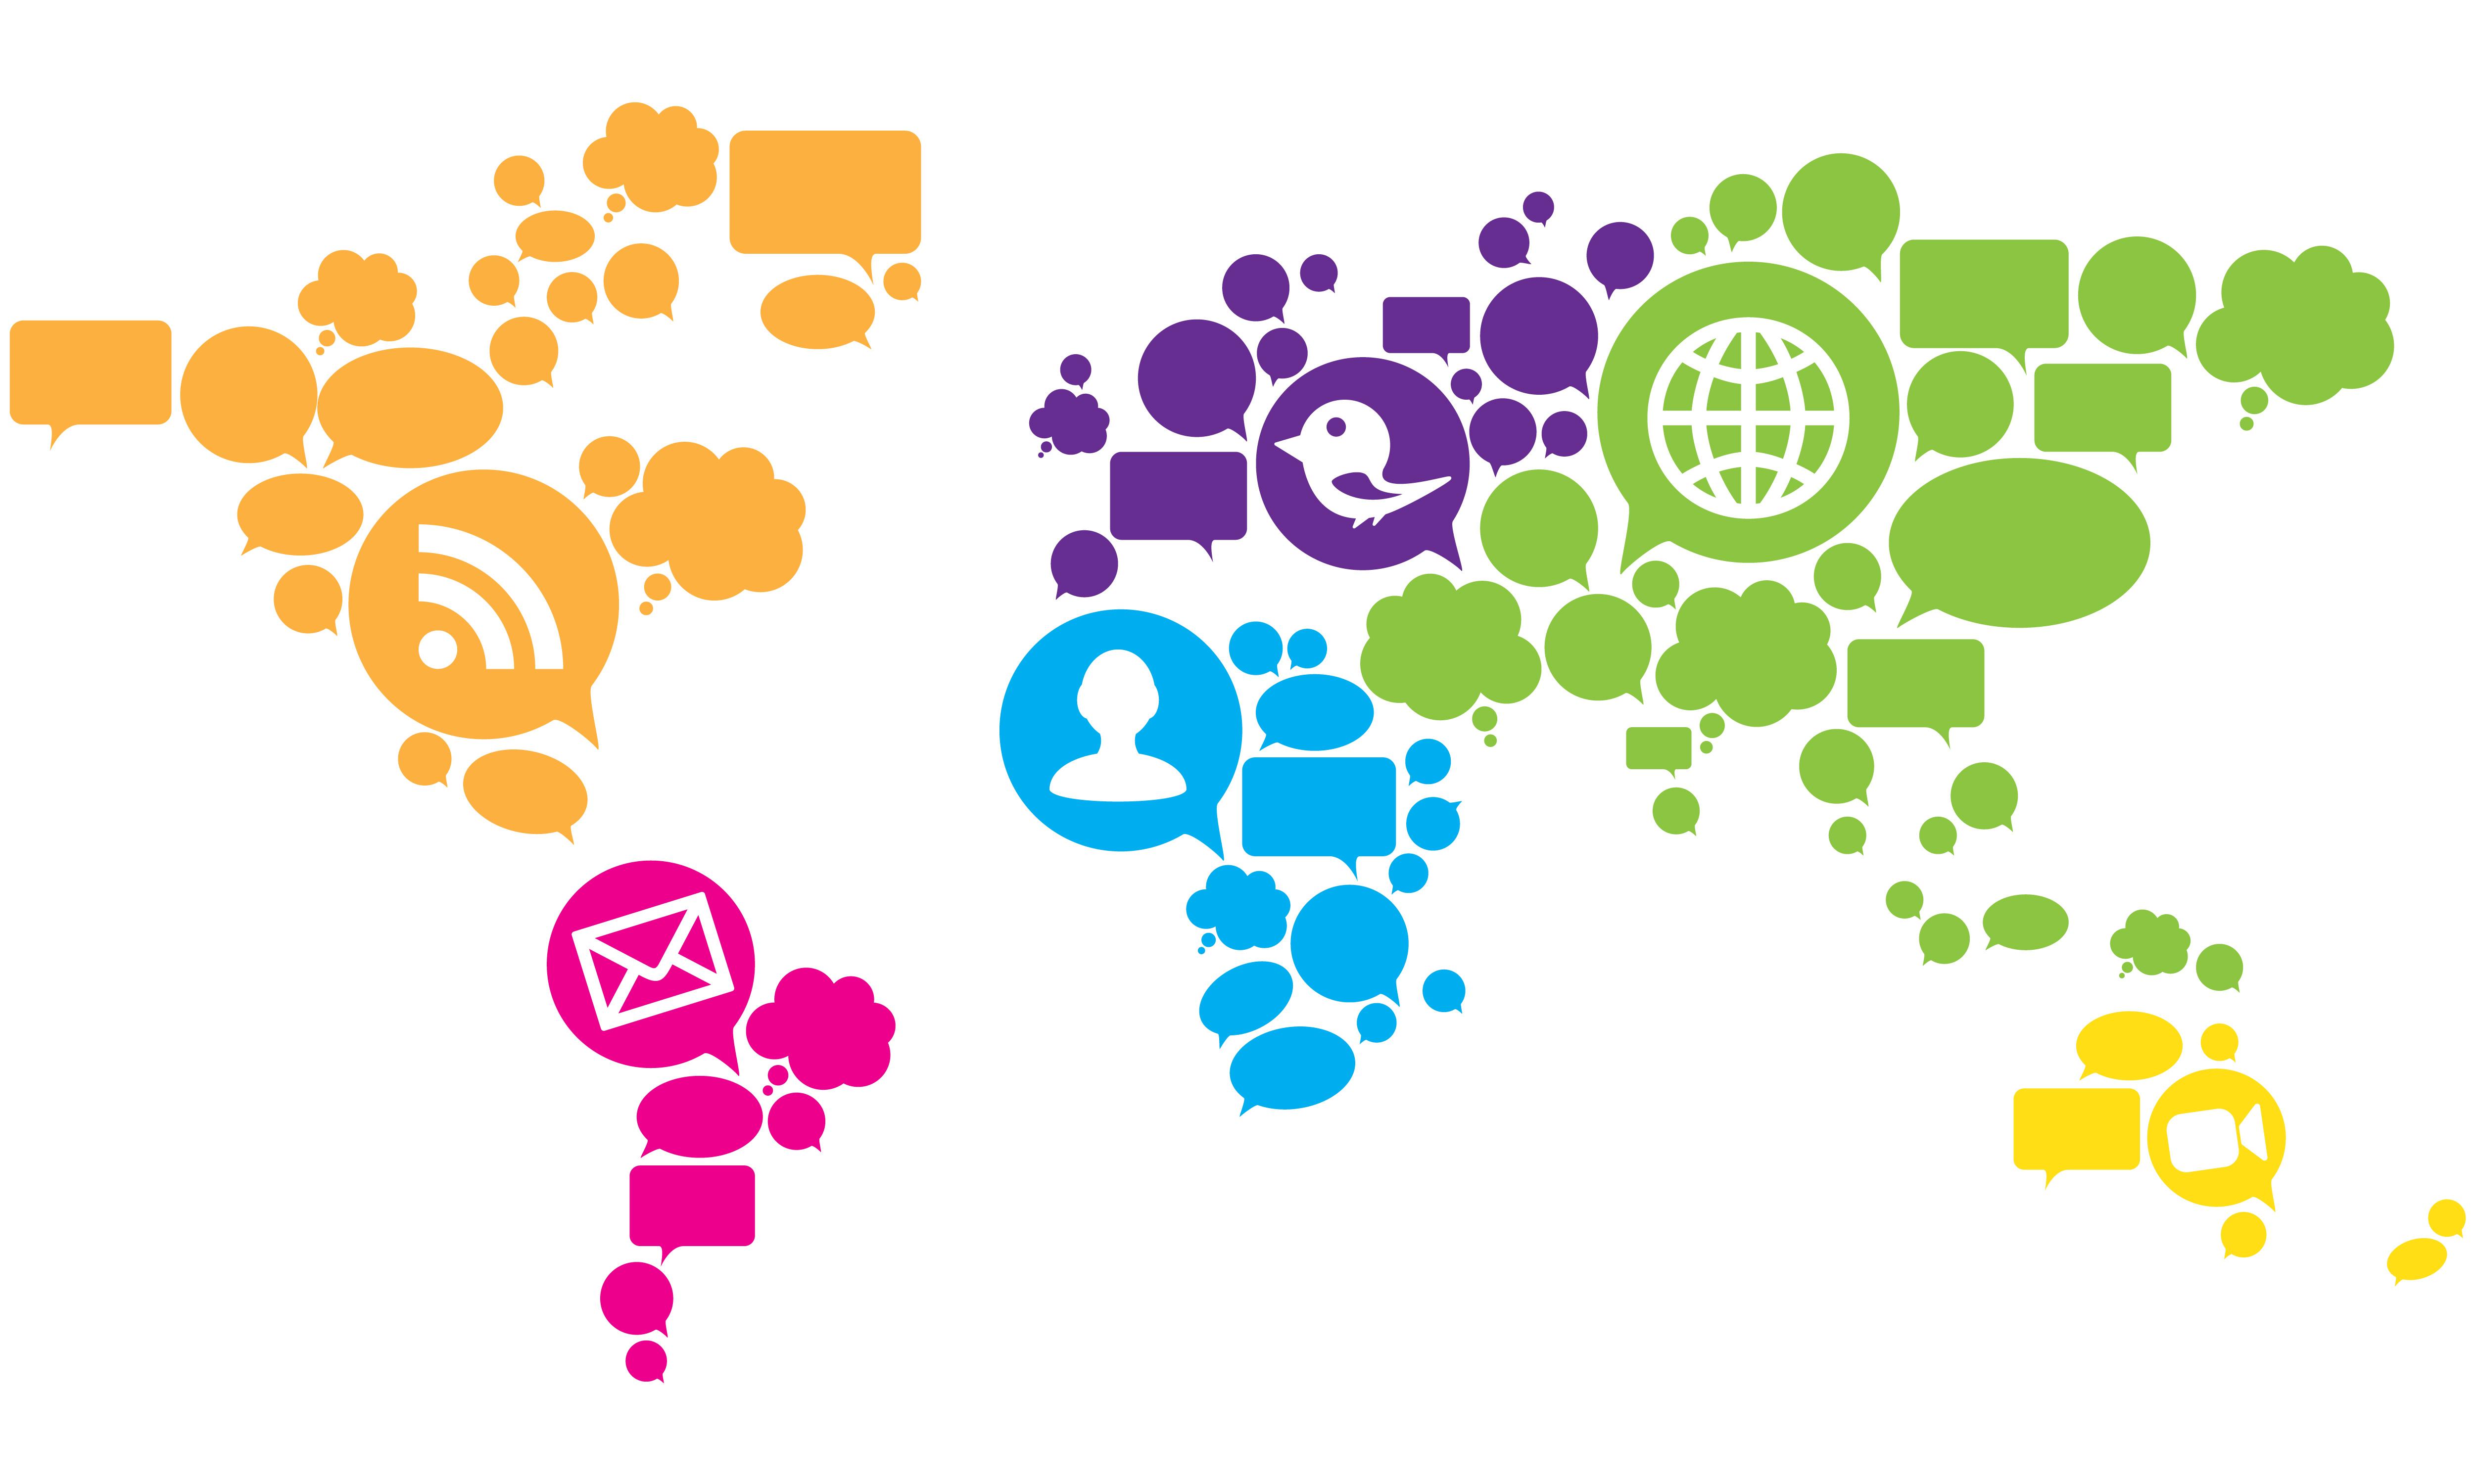 Global Marketing. Image Source: http://advfree.it